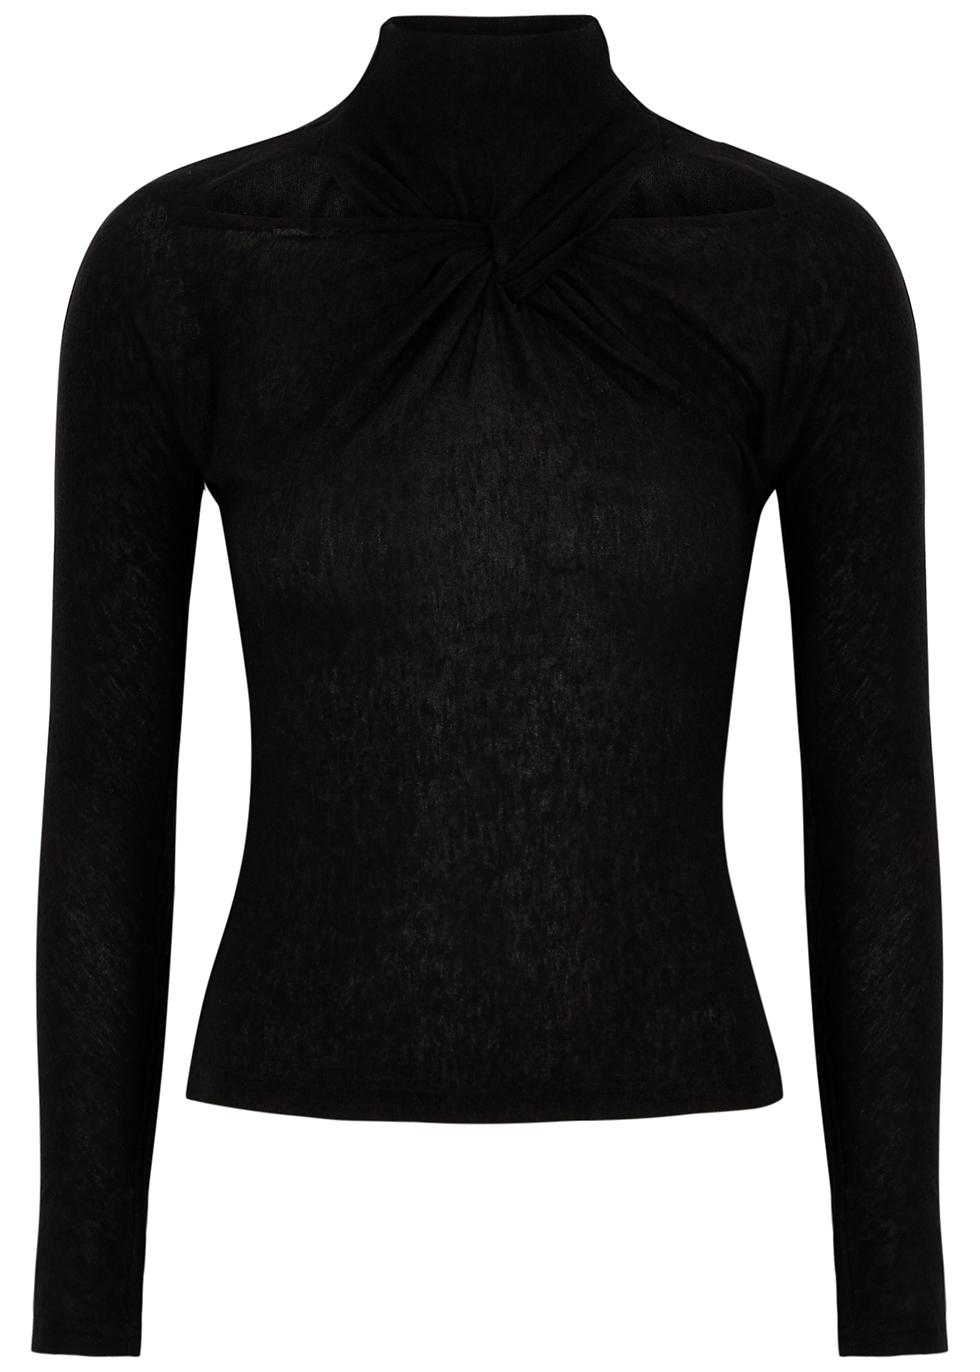 Maia black twist-effect jersey top